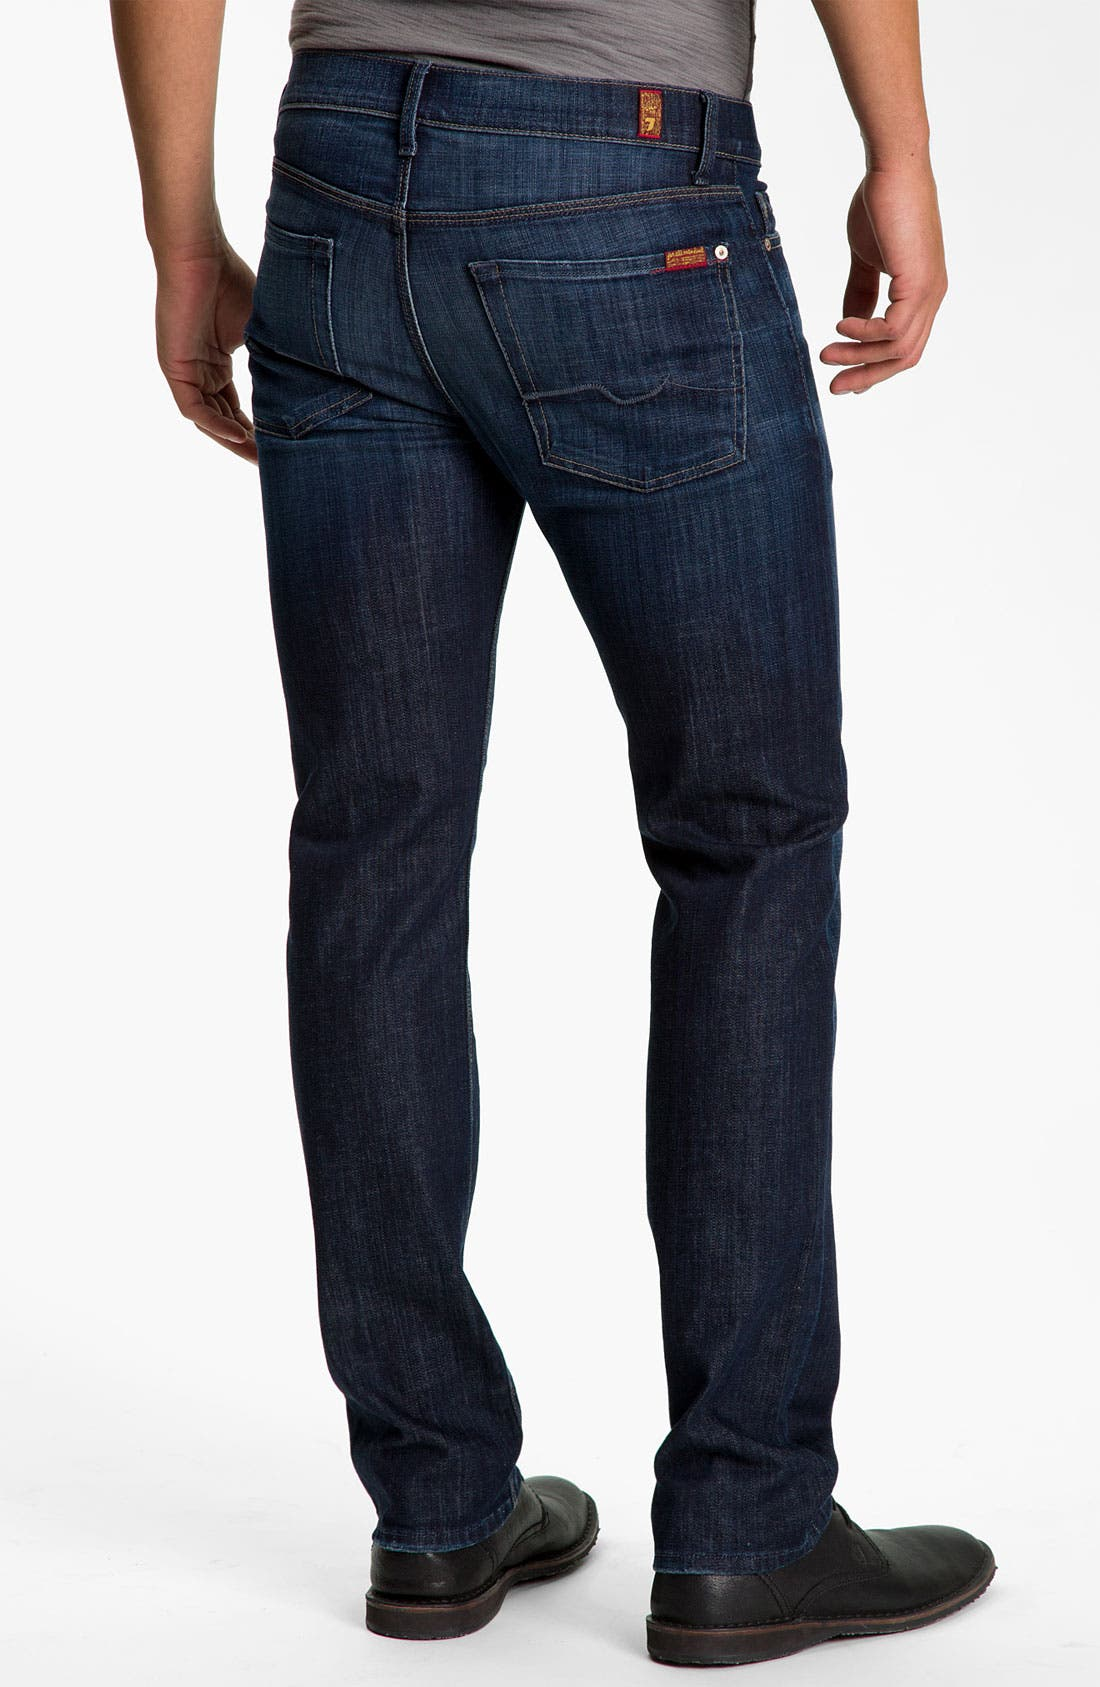 Slimmy Slim Fit Jeans,                             Alternate thumbnail 6, color,                             LOS ANGELES DARK